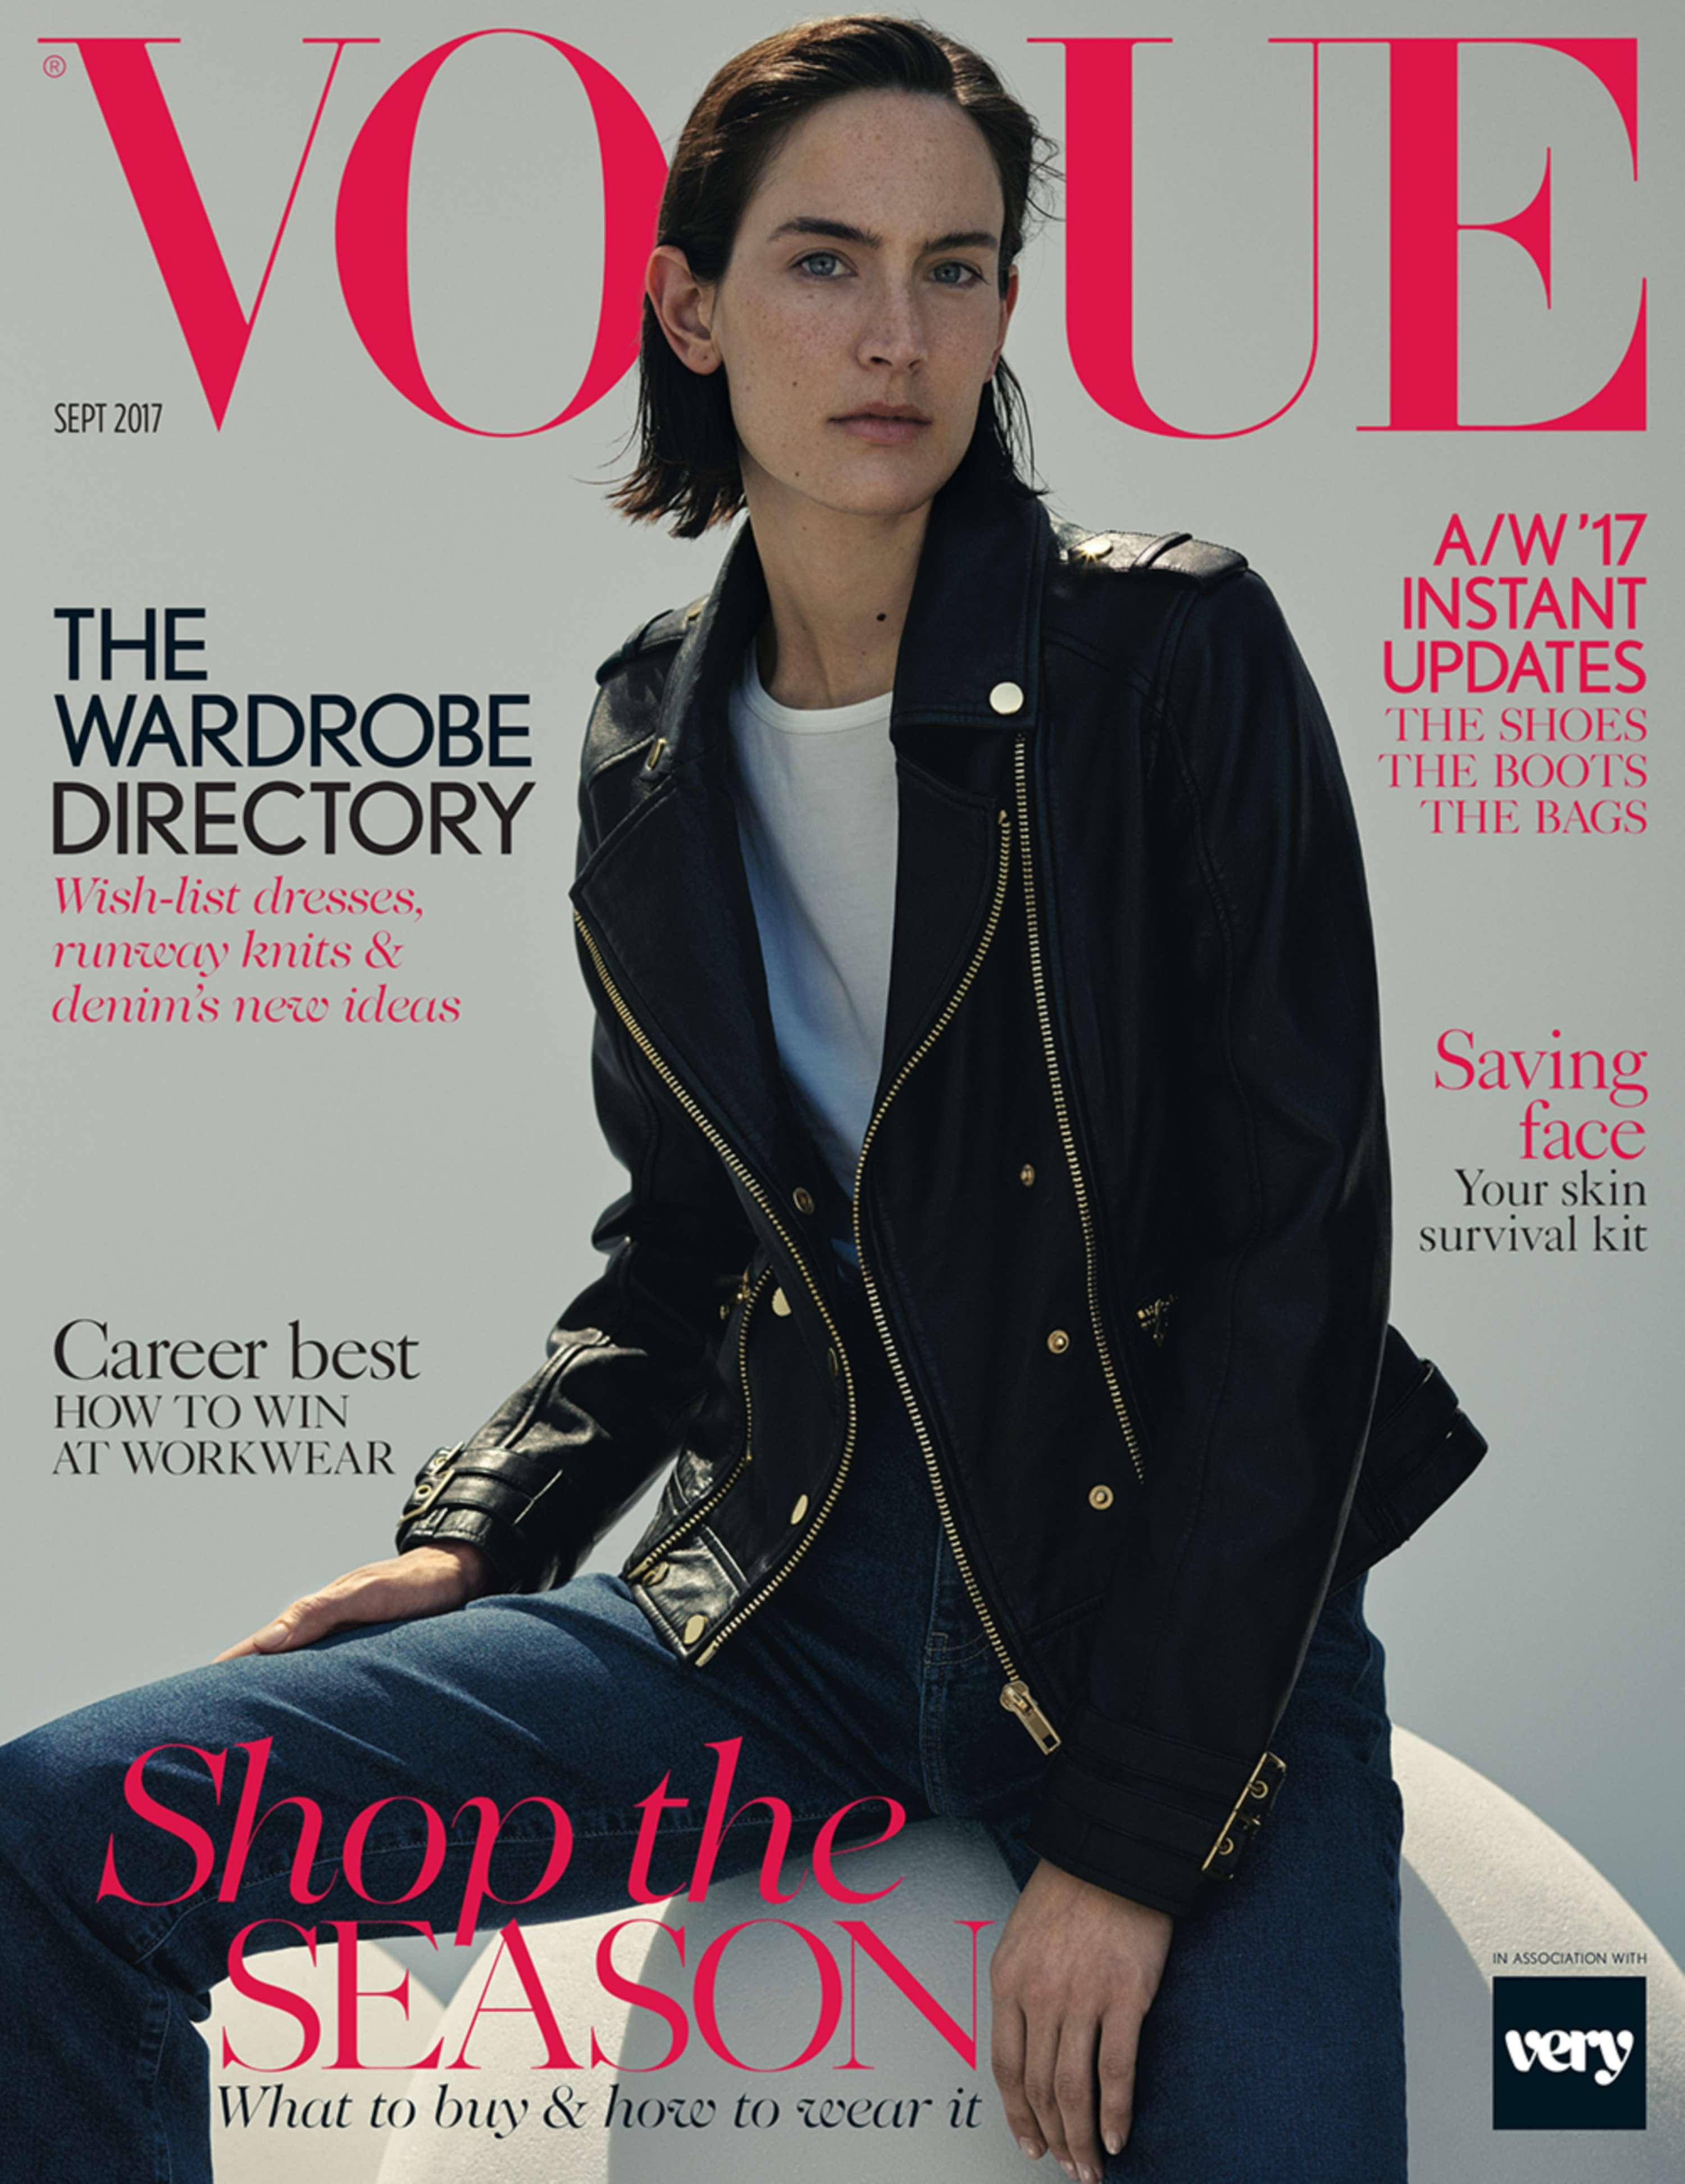 e18b9bf35d British Vogue Shop The Season  Jane Moseley